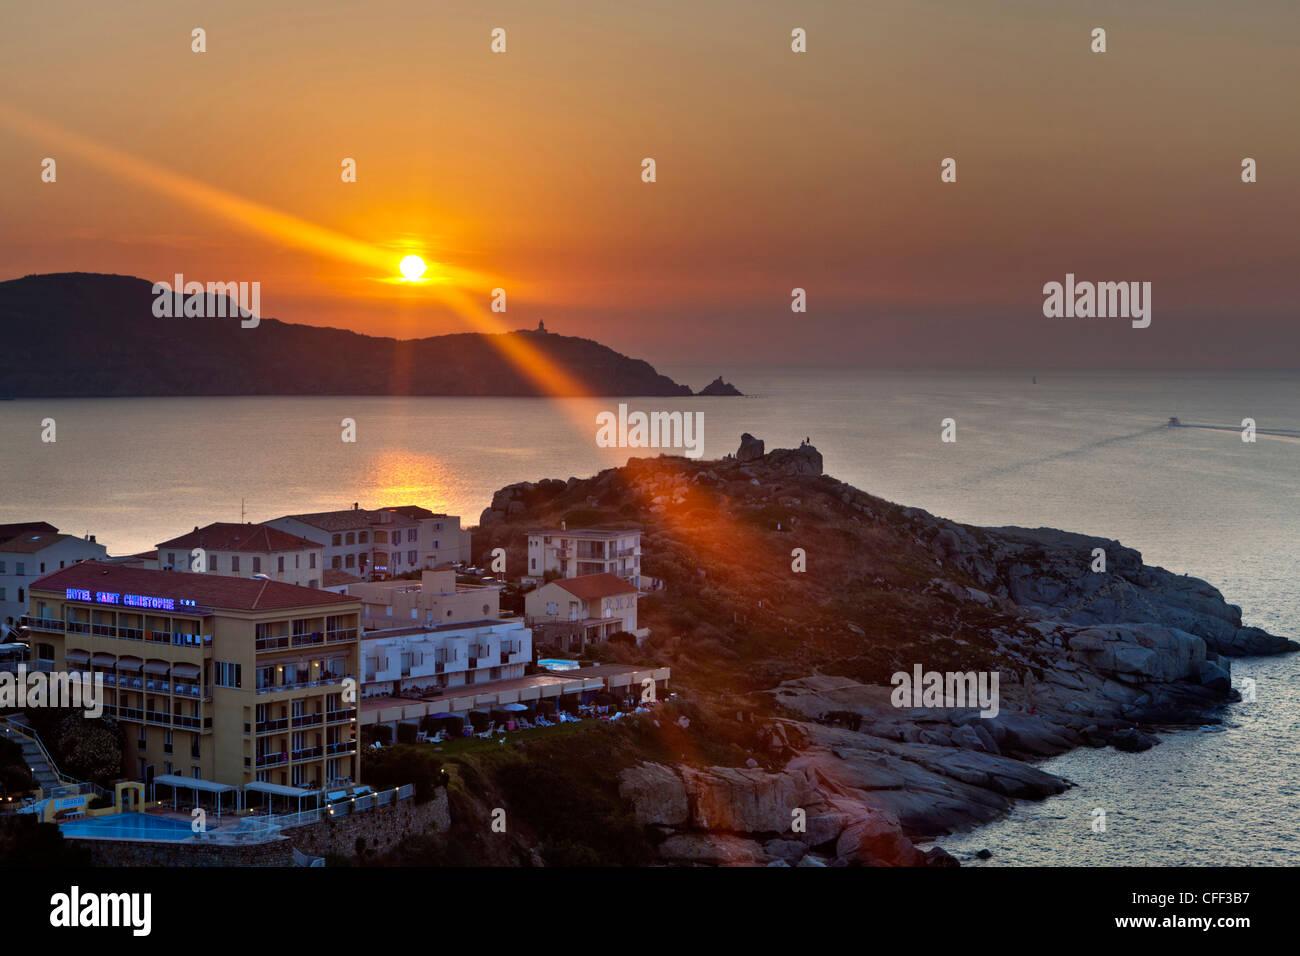 Sonnenuntergang, Golfe De La Revelata, Calvi, Korsika, Frankreich Stockbild